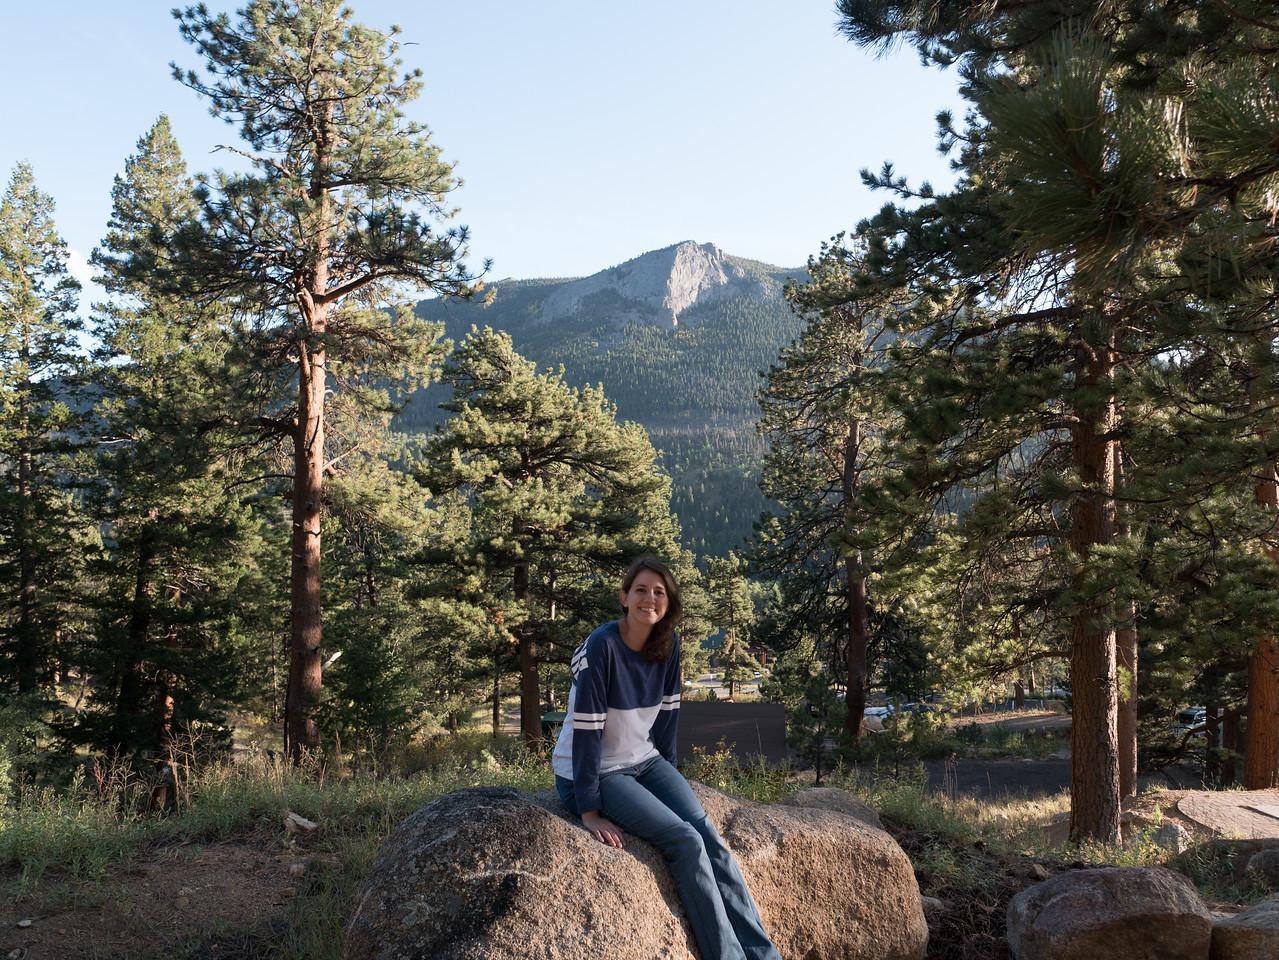 In Front of Deer Mountain